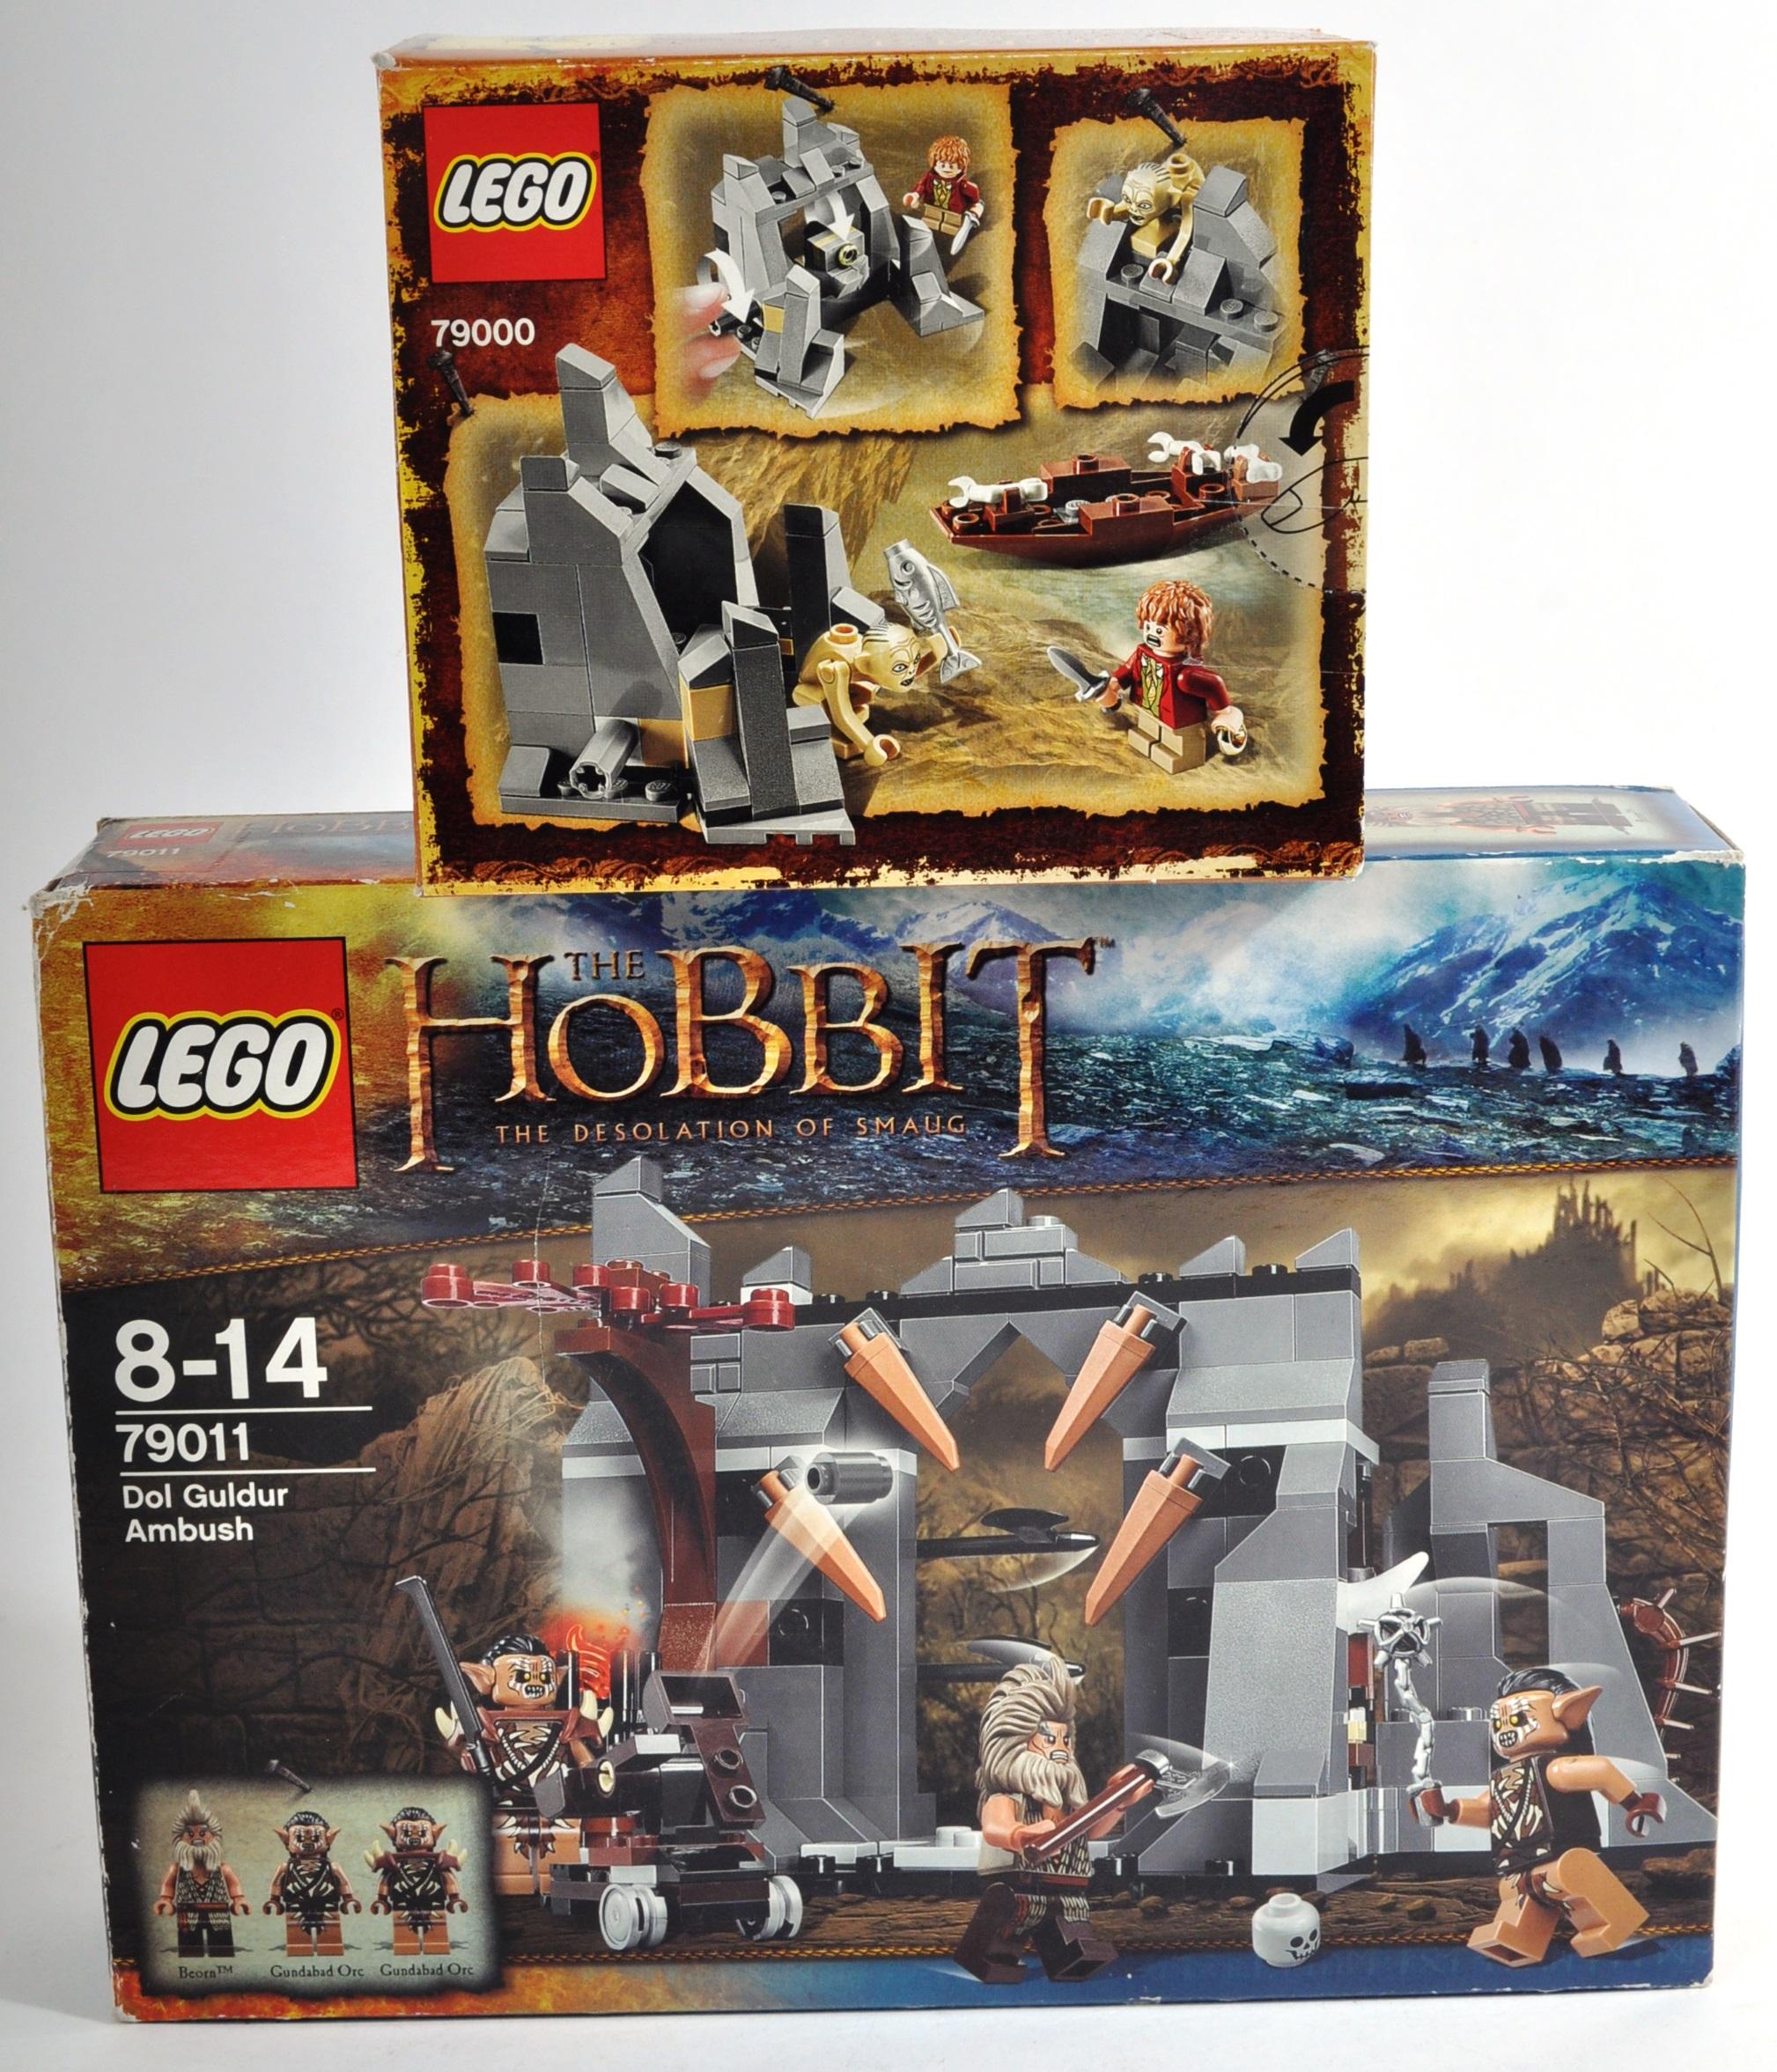 LEGO SETS - THE HOBBIT - 79000 / 79011 - Image 4 of 7